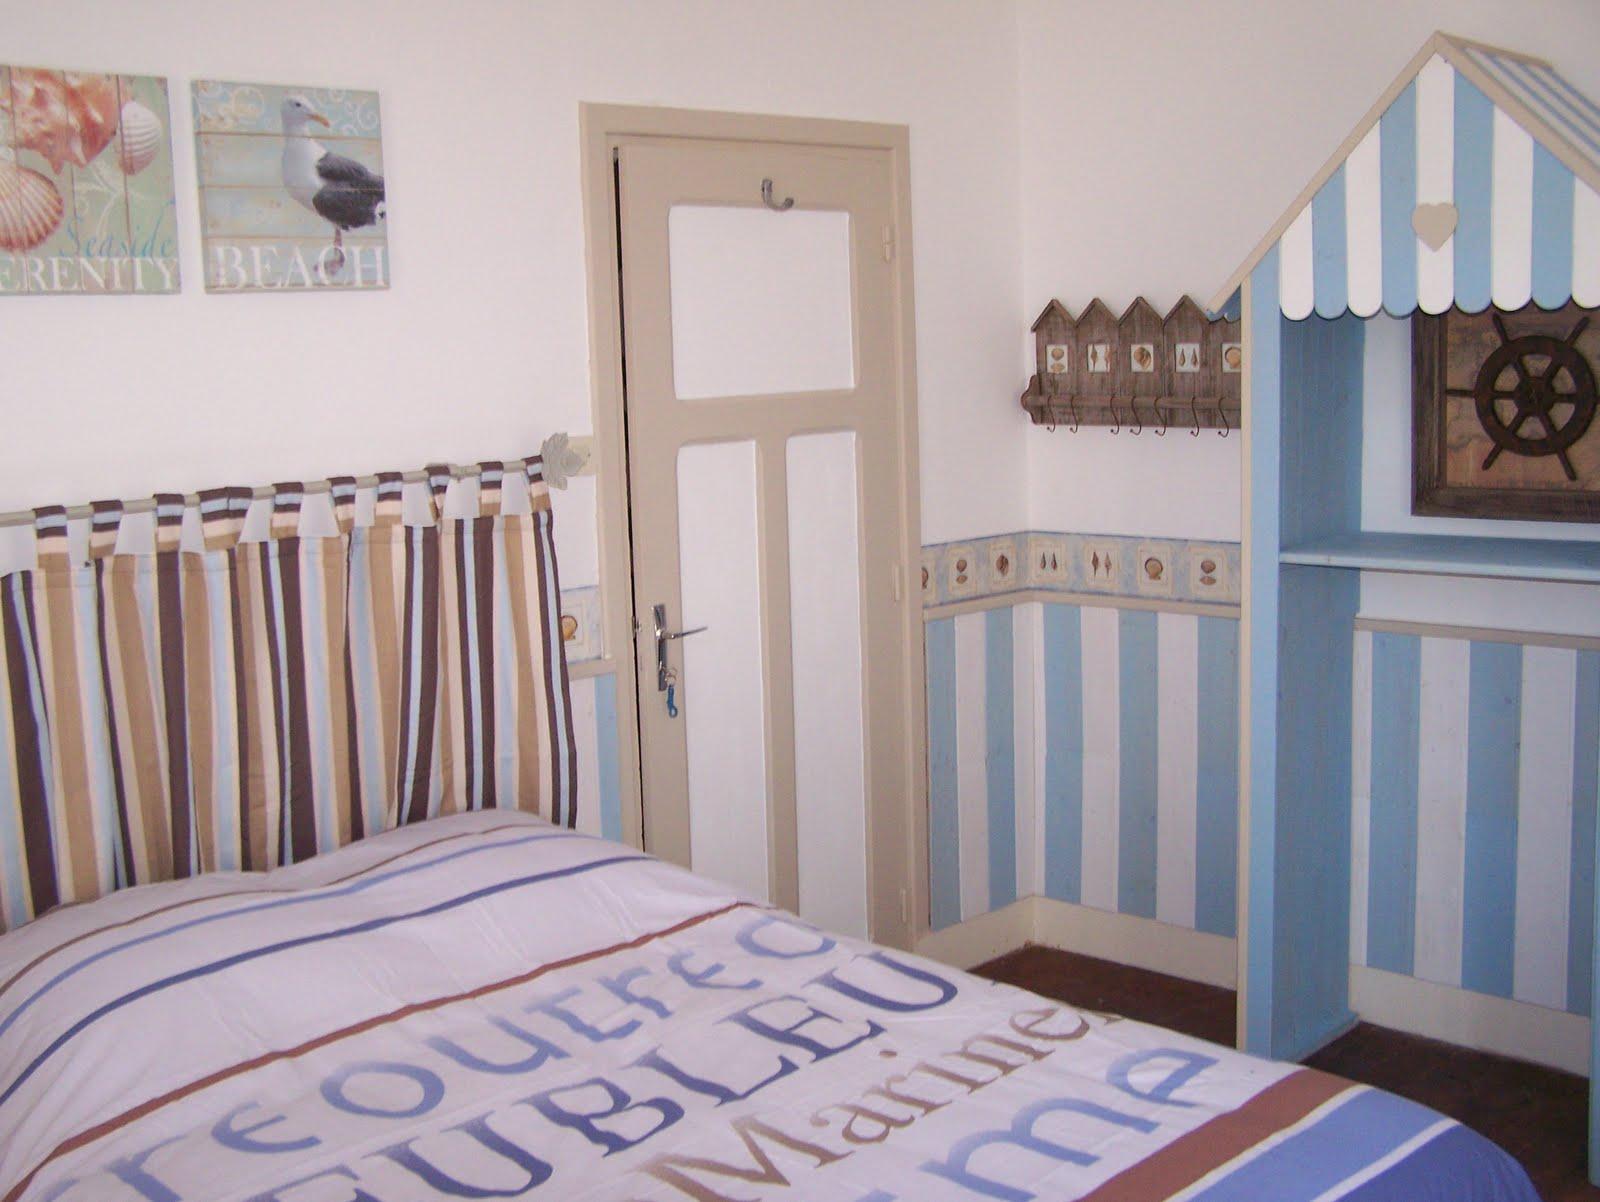 chambres d 39 h tes de charme chambre marine 1. Black Bedroom Furniture Sets. Home Design Ideas